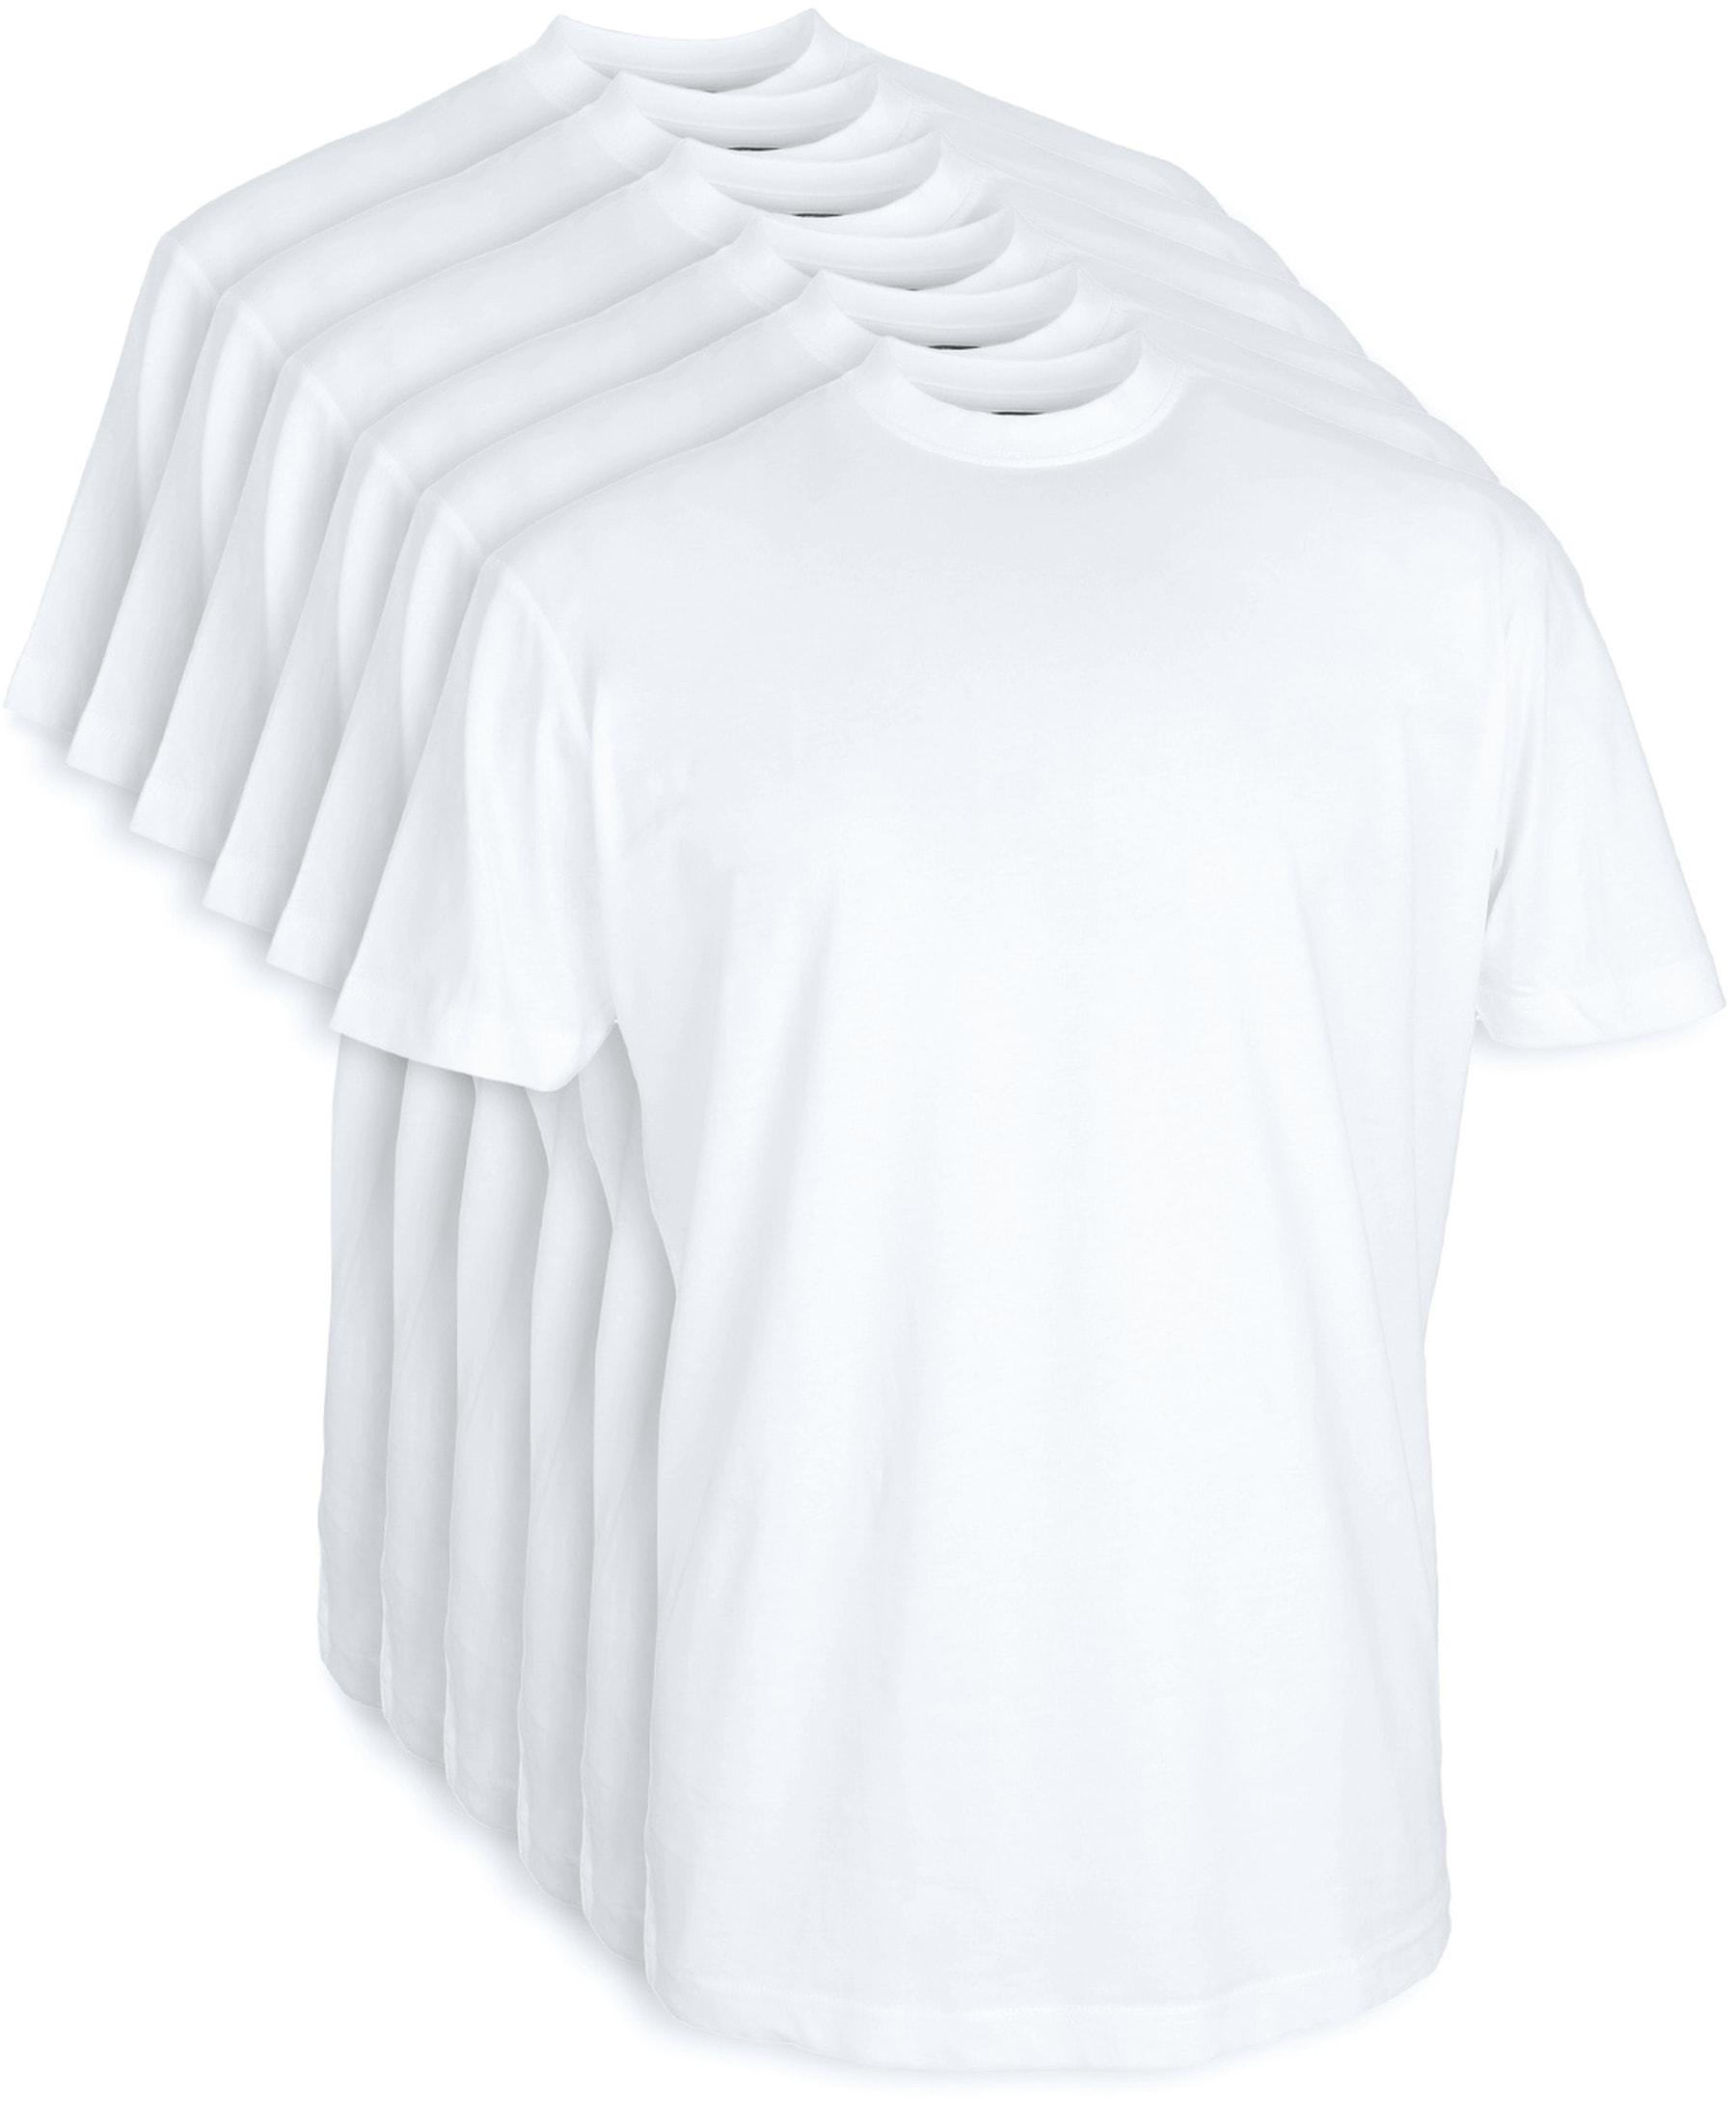 T-shirt Brede Ronde Hals 6-Pack (6 stuks) foto 0